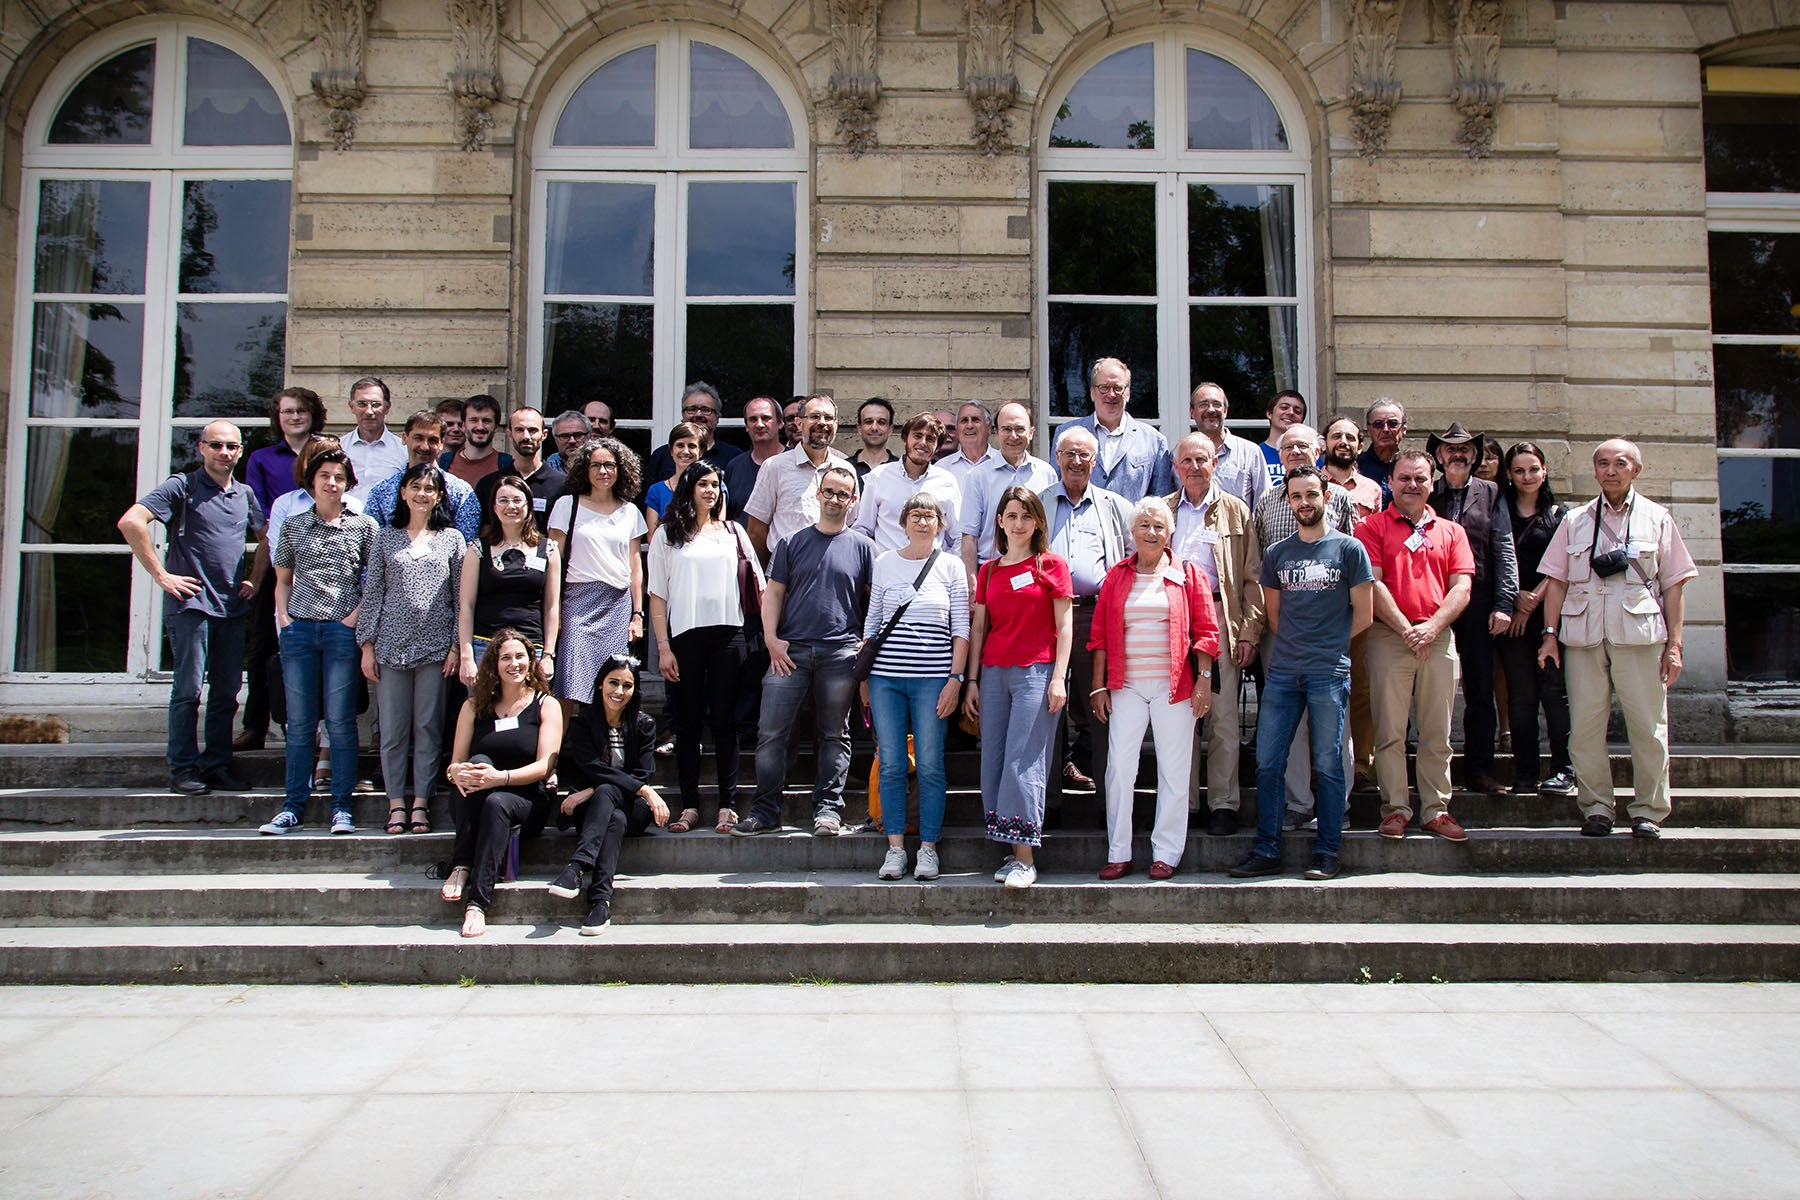 000_Anniversaire-SFMC-Groupes-1